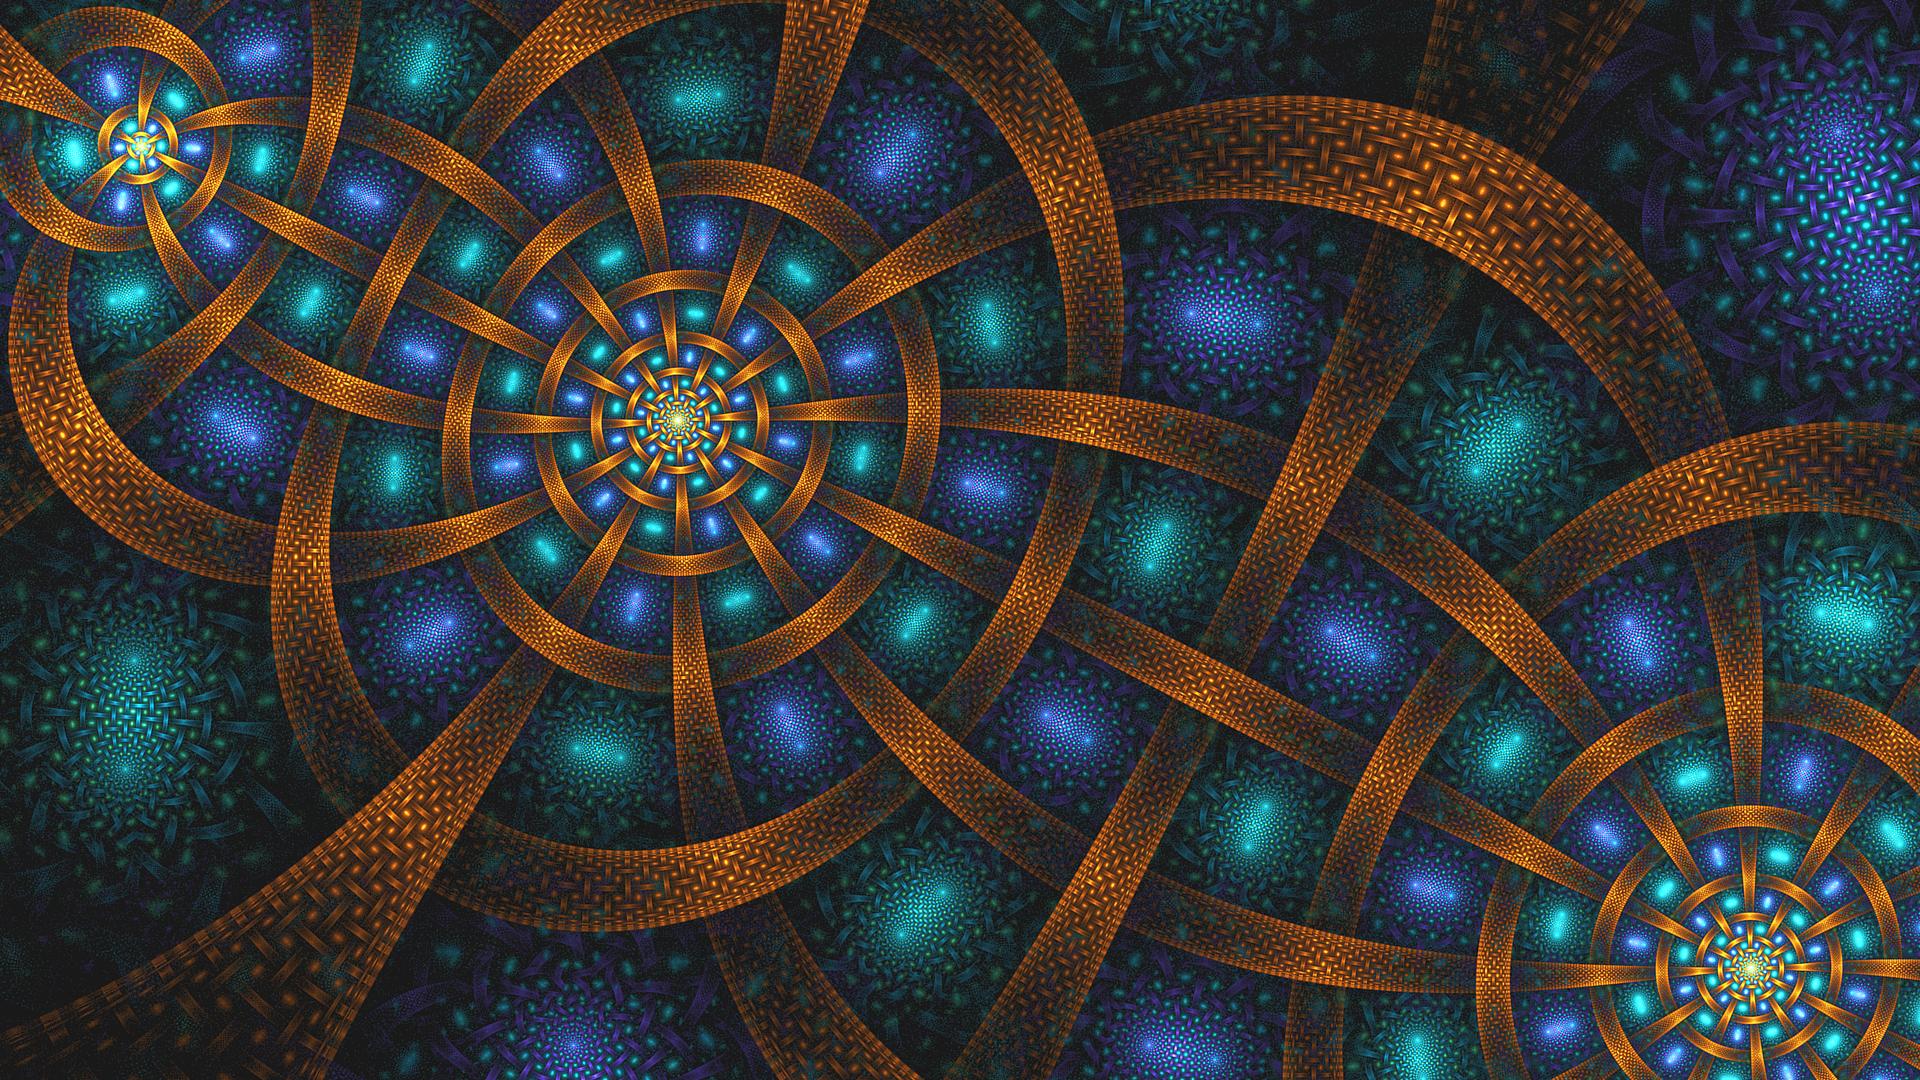 Hall of Infinite Creation - by Monkeyshack (me)